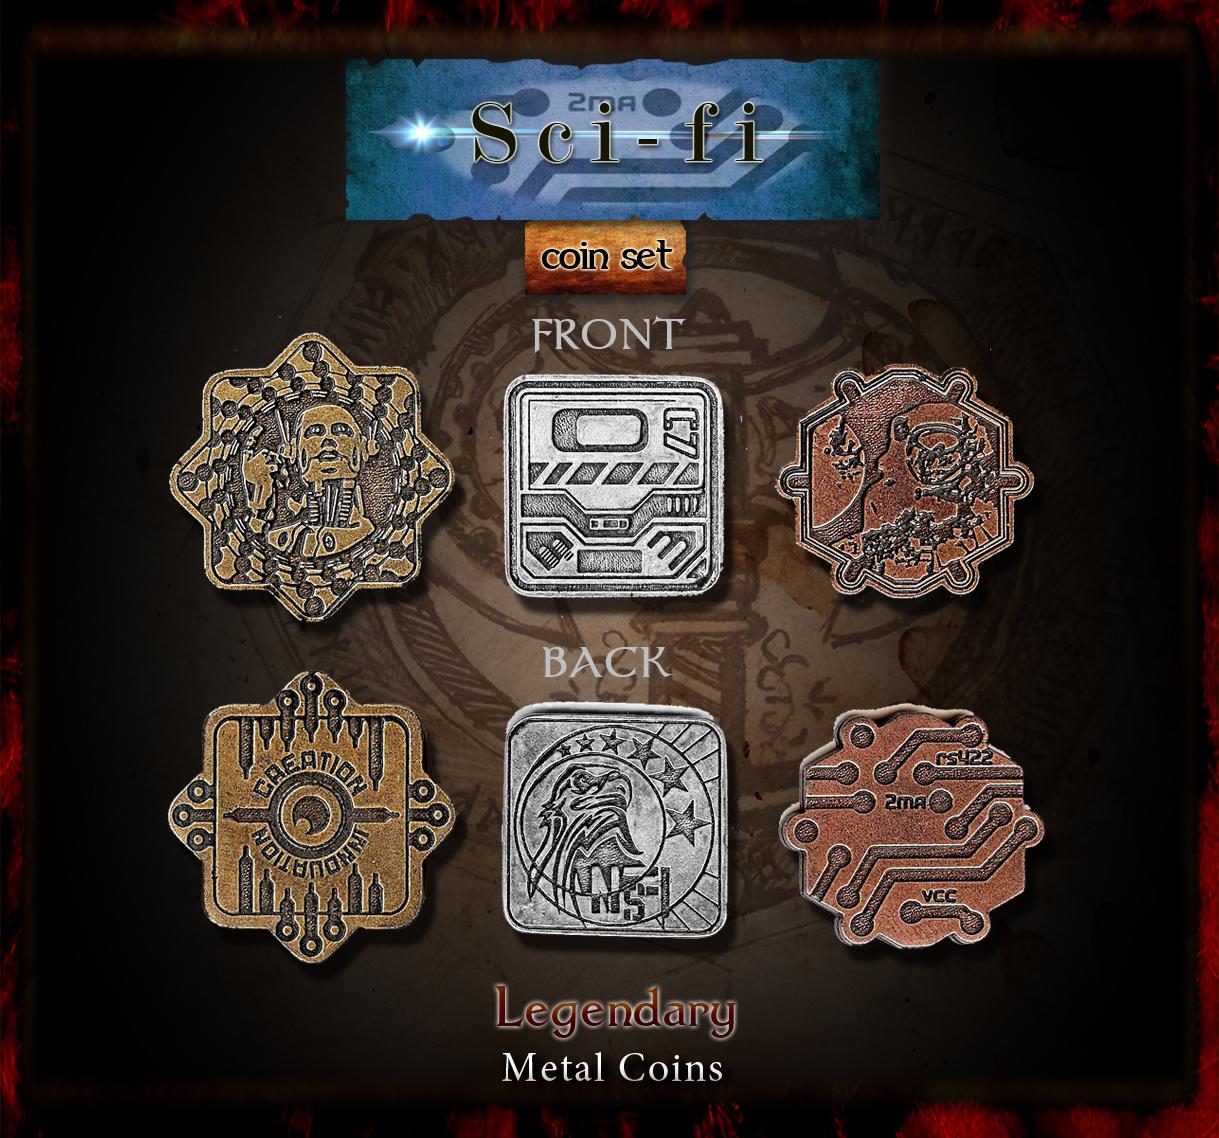 Sci Fi Set Legendary Metal Coins Drawlab Entertainment